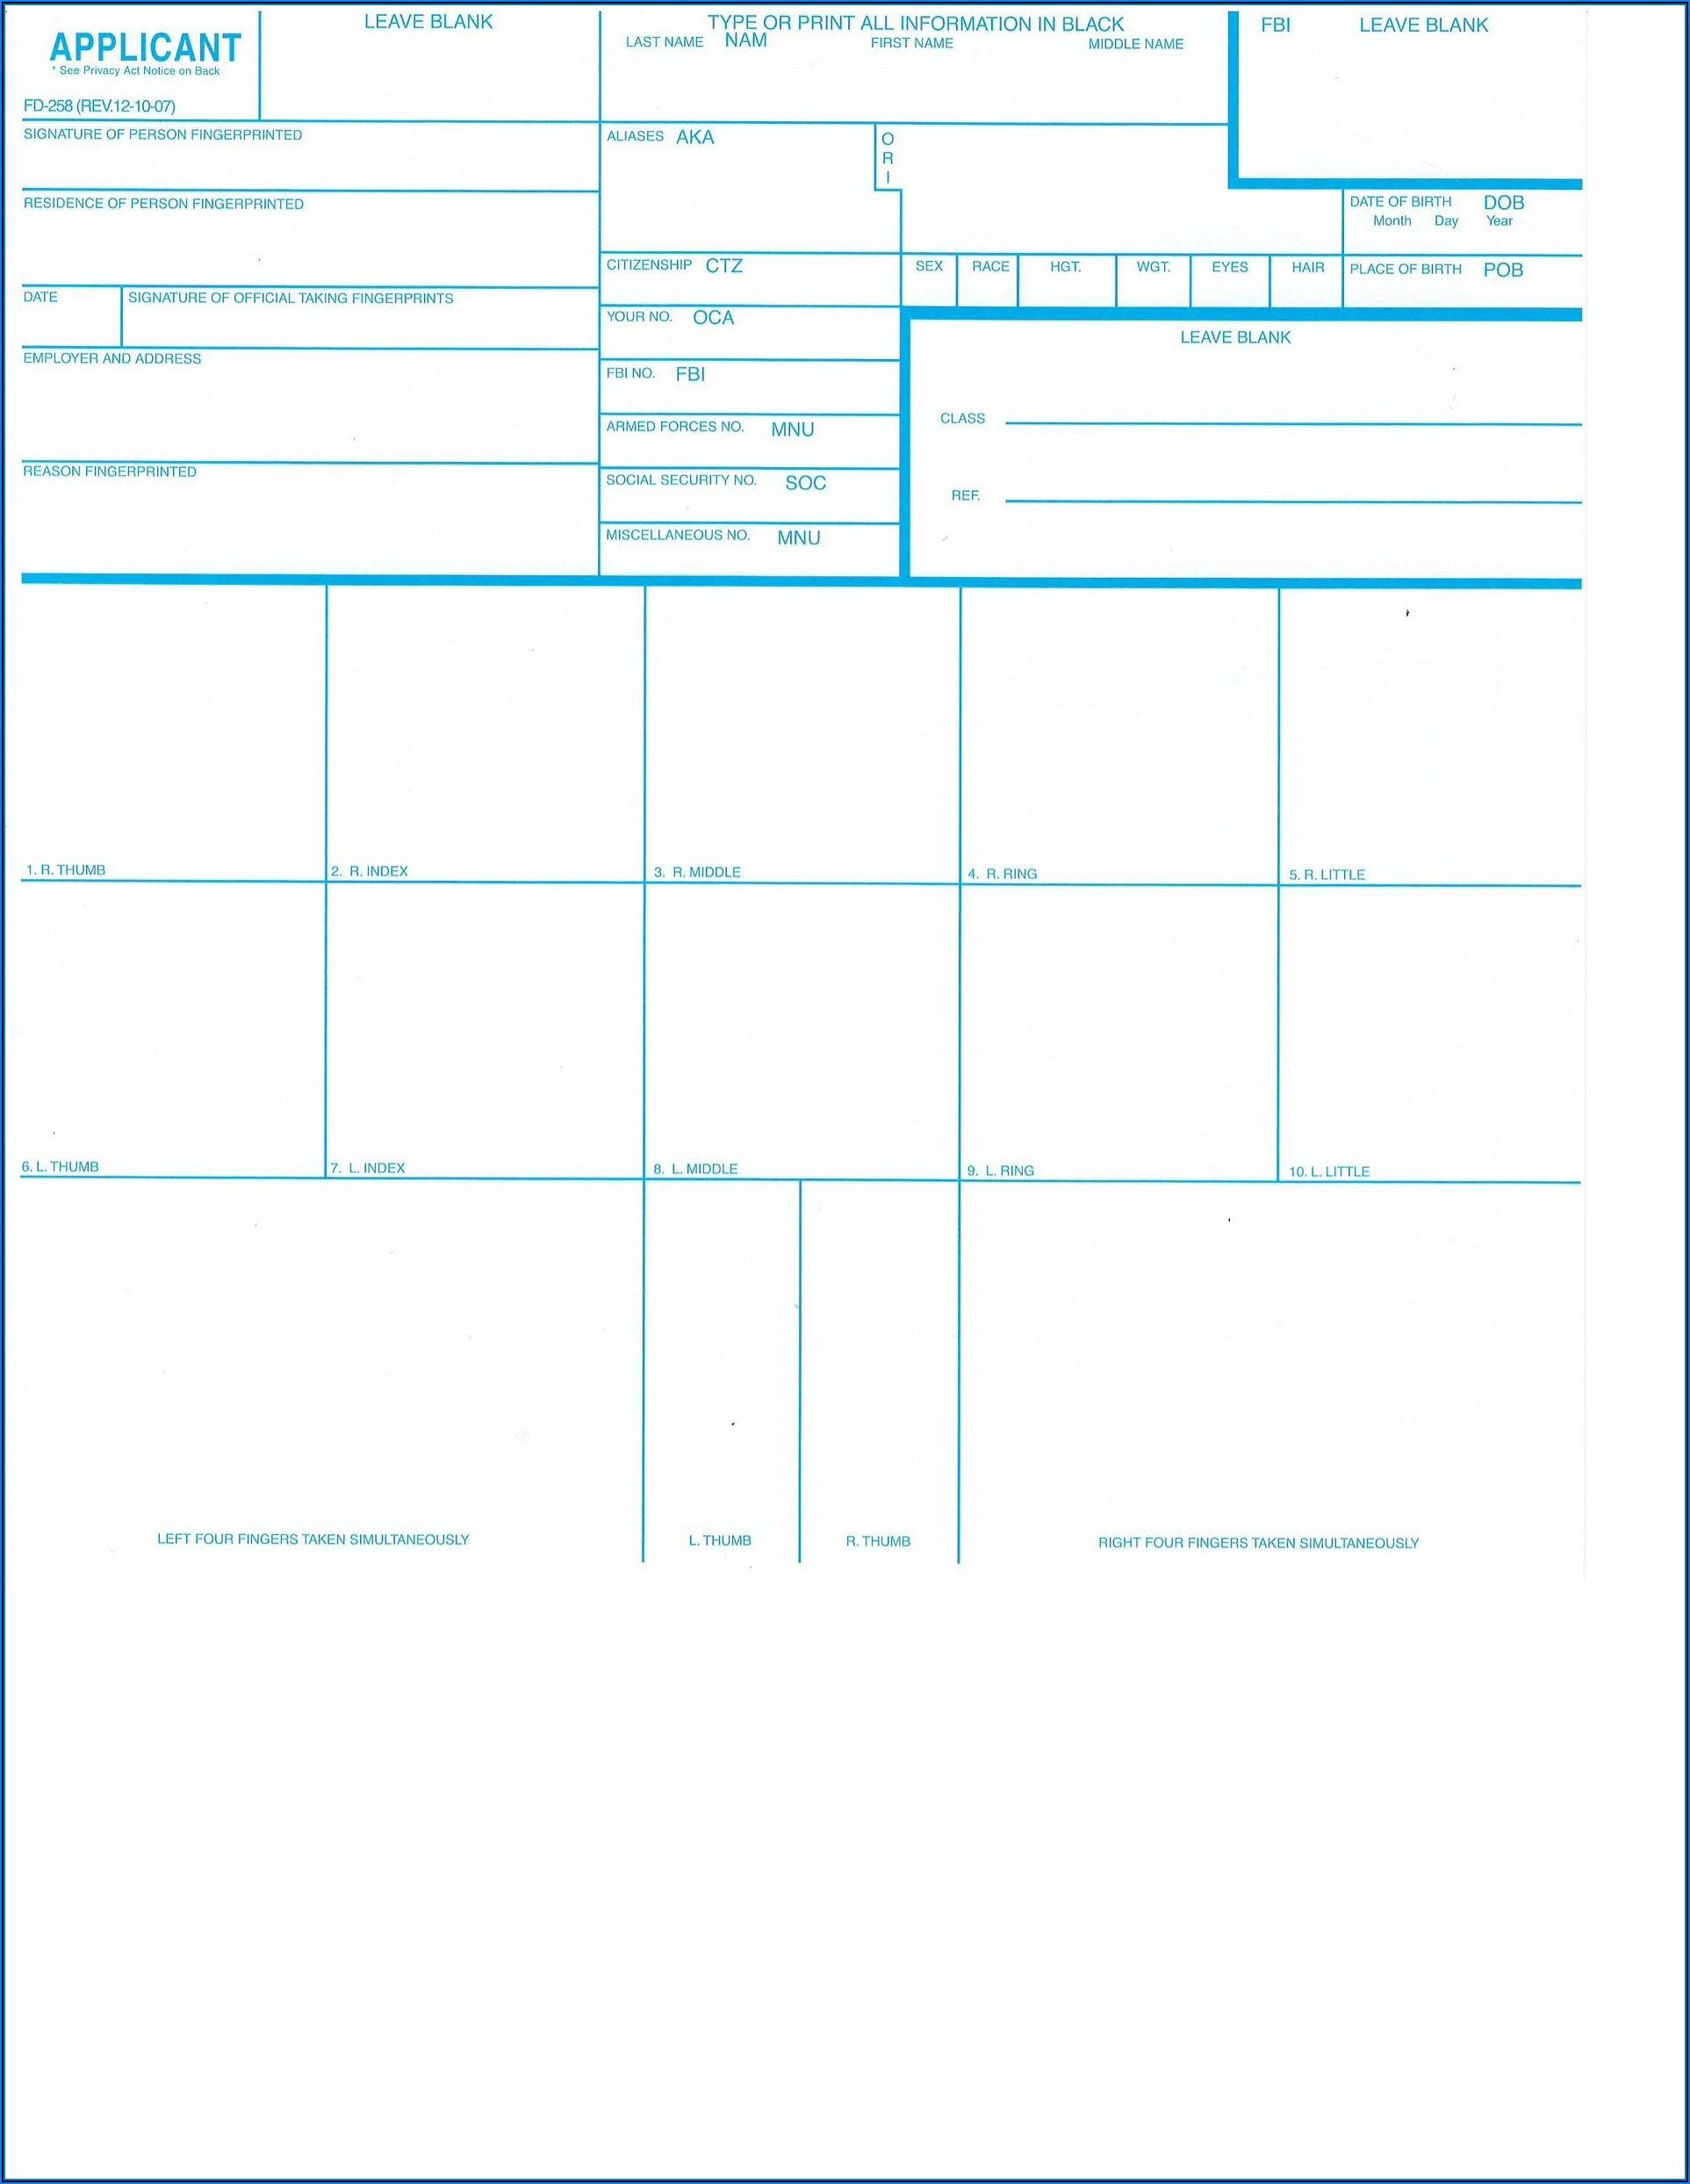 Two Complete Fingerprint Cards (form Fd 258)